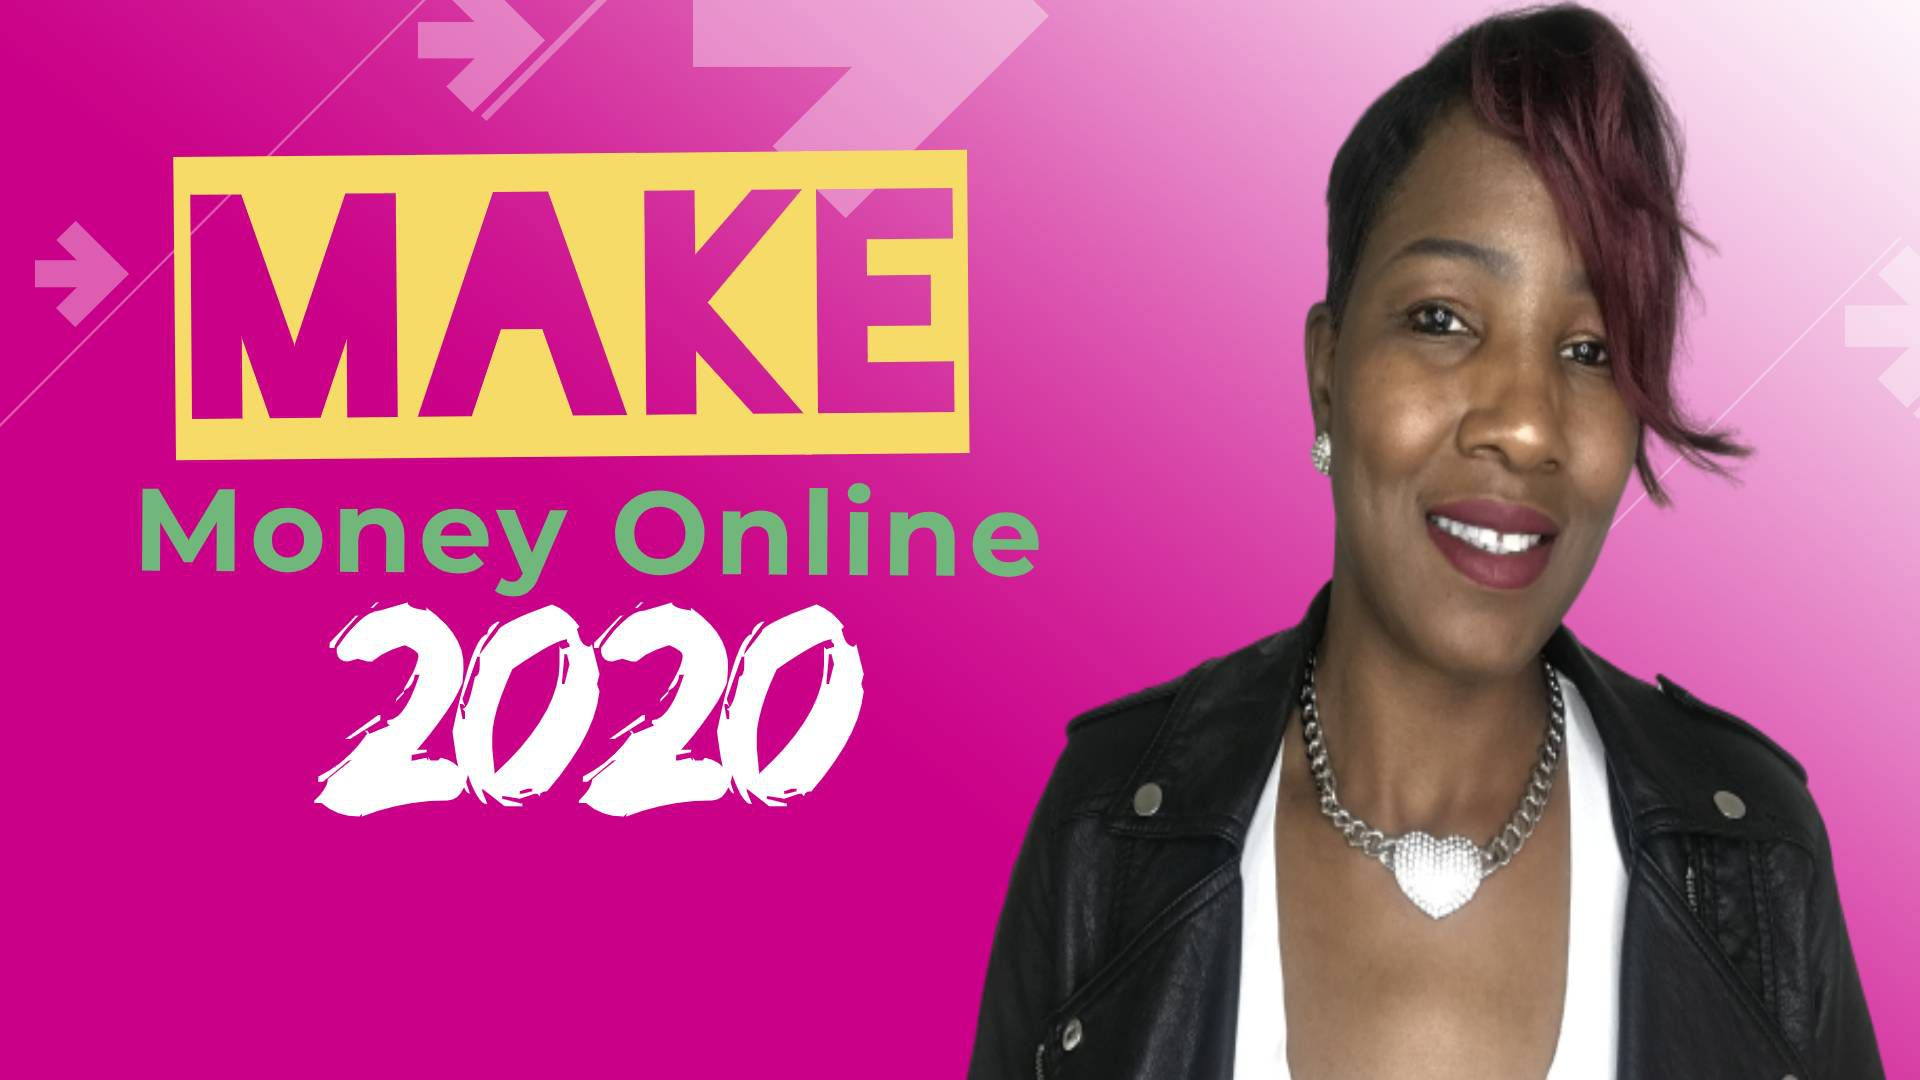 make money2020 thunmbnail